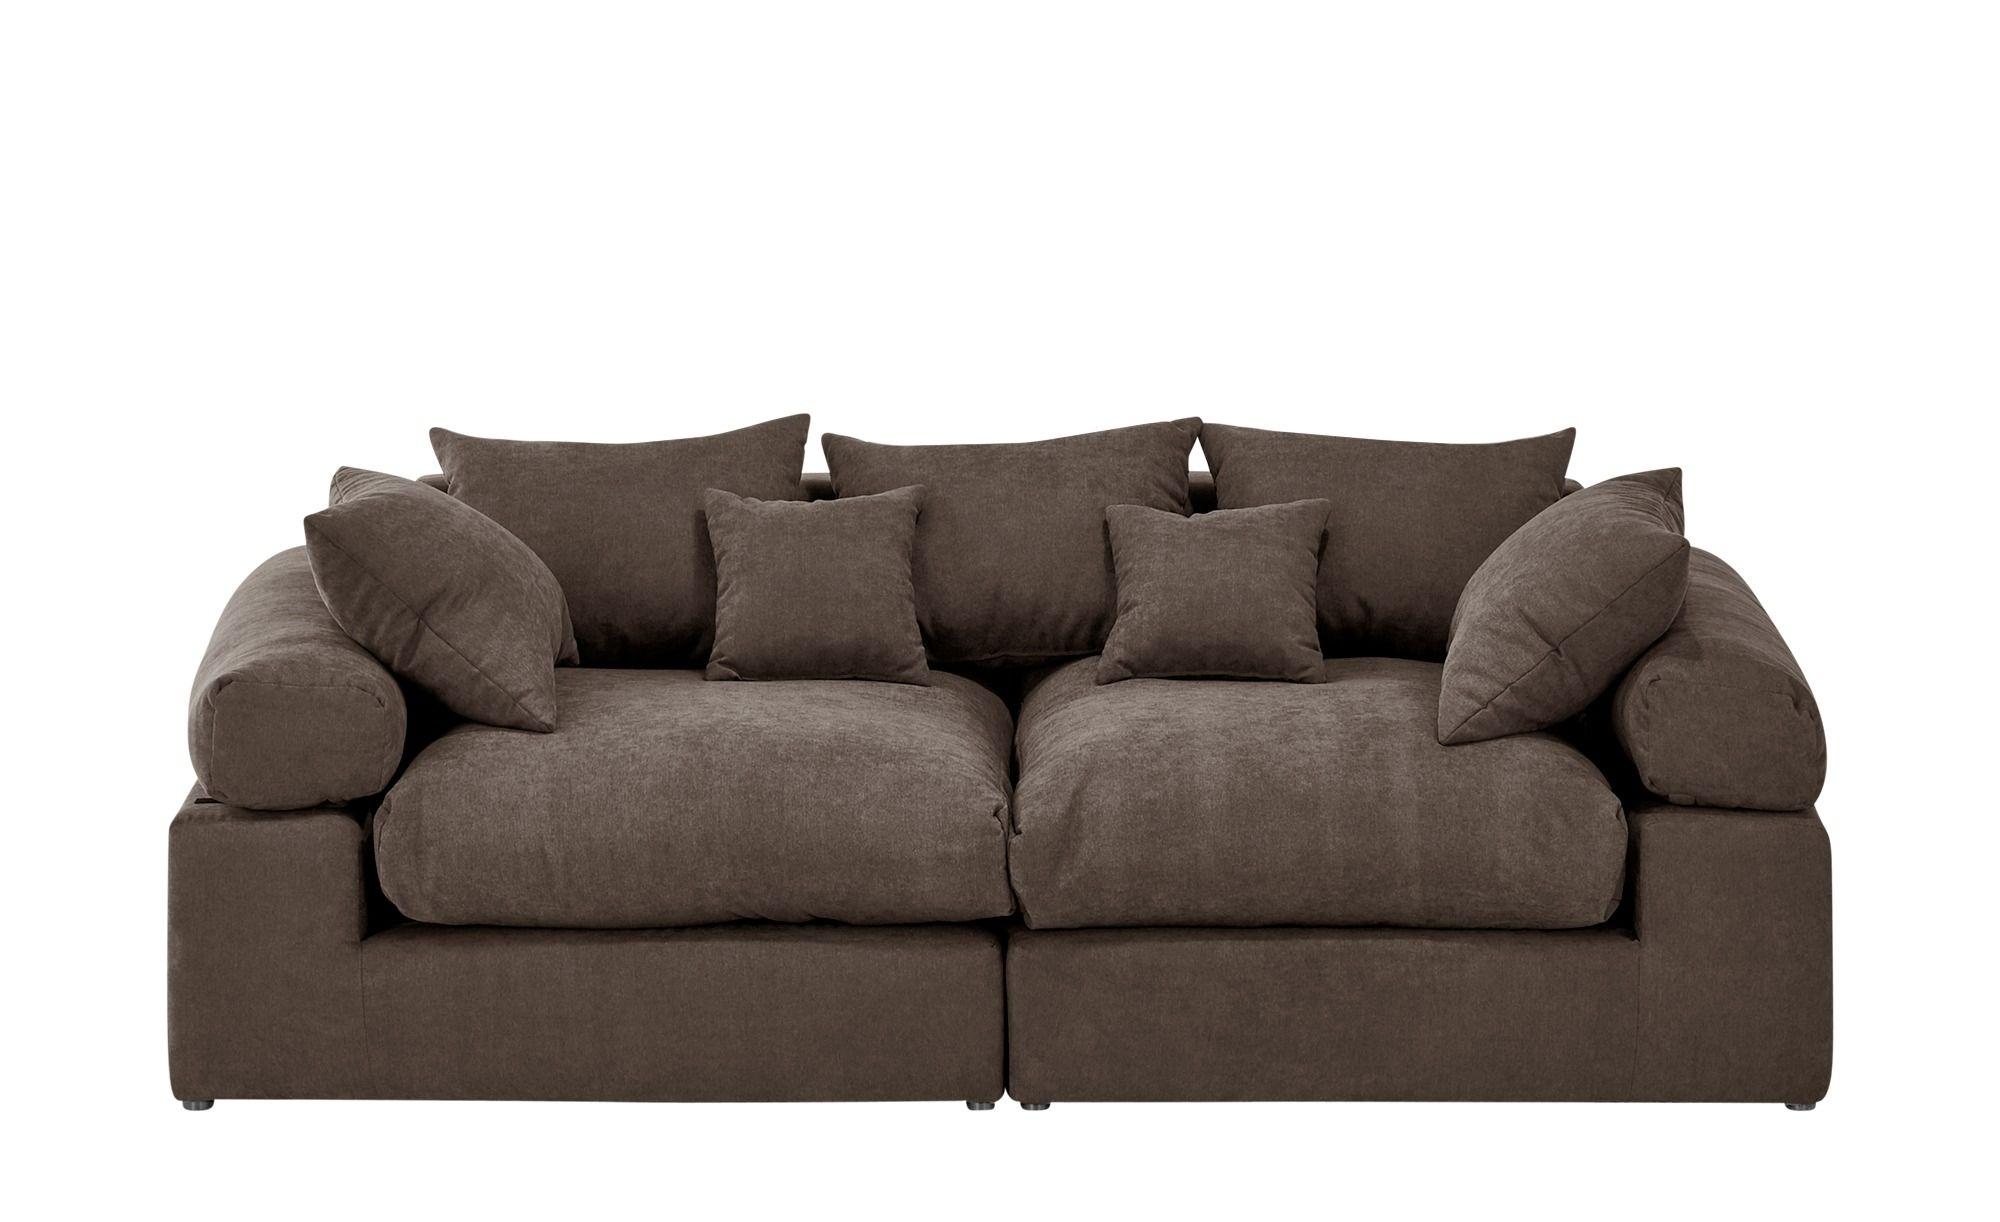 Smart Big Sofa Lionore Mit Bildern Grosse Sofas Grosses Sofa Sofa